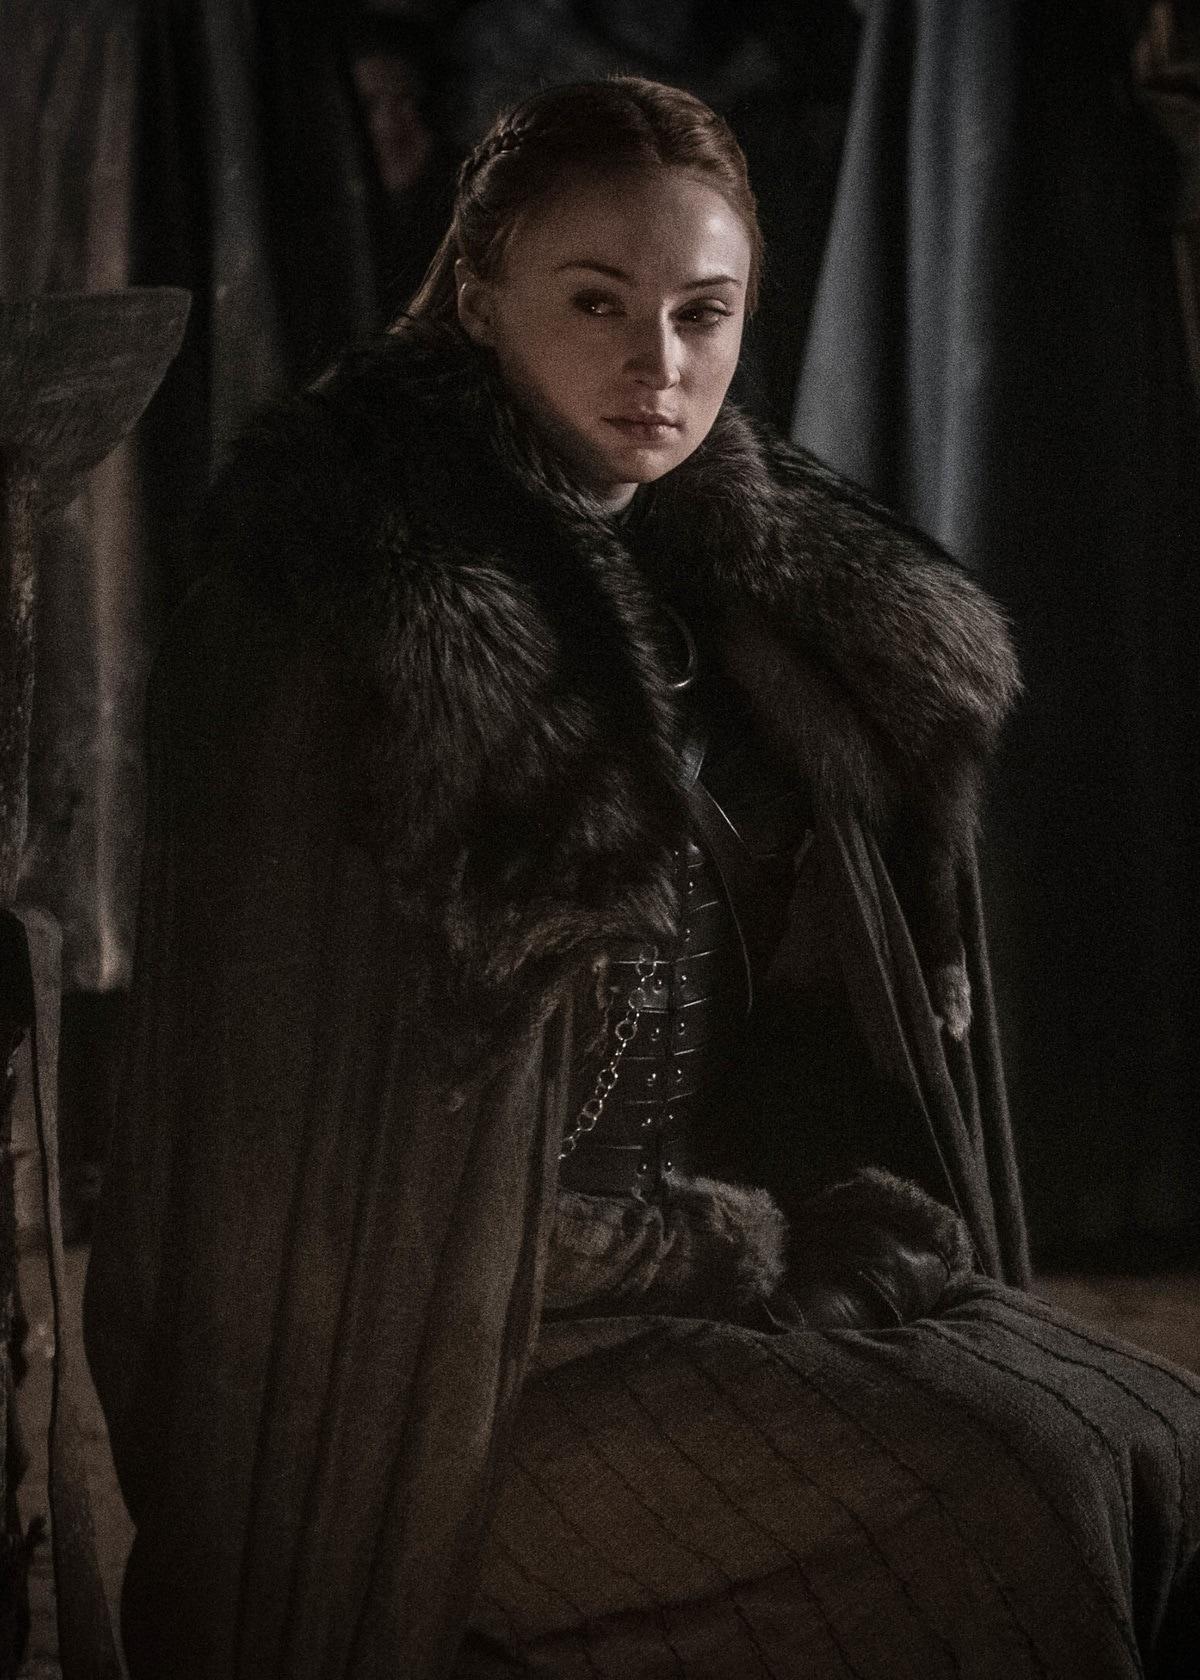 game of thrones season 8 episode 3 sansa stark Sansa Game of Thrones season 8 episode 3